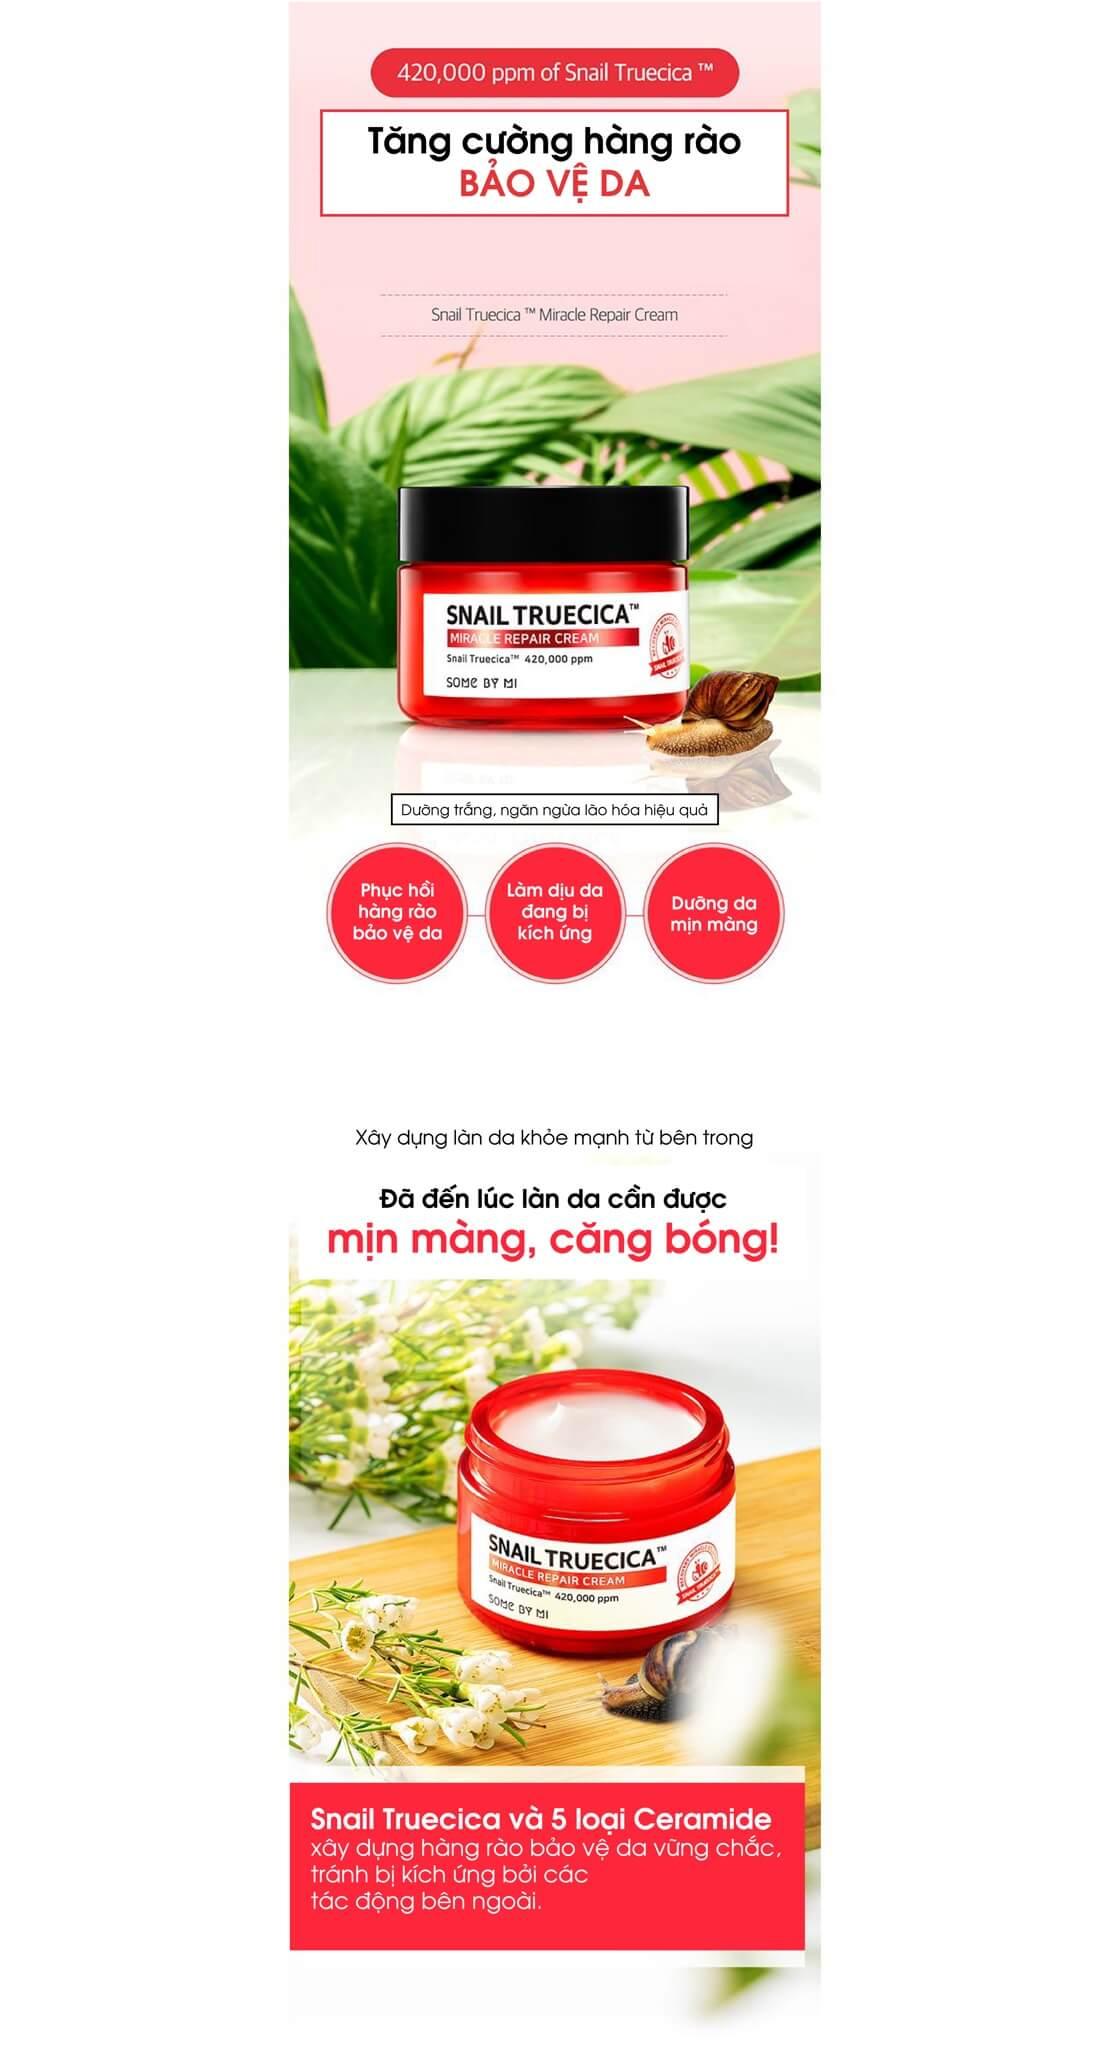 công dụng Snail Truecica Miracle Repair Cream